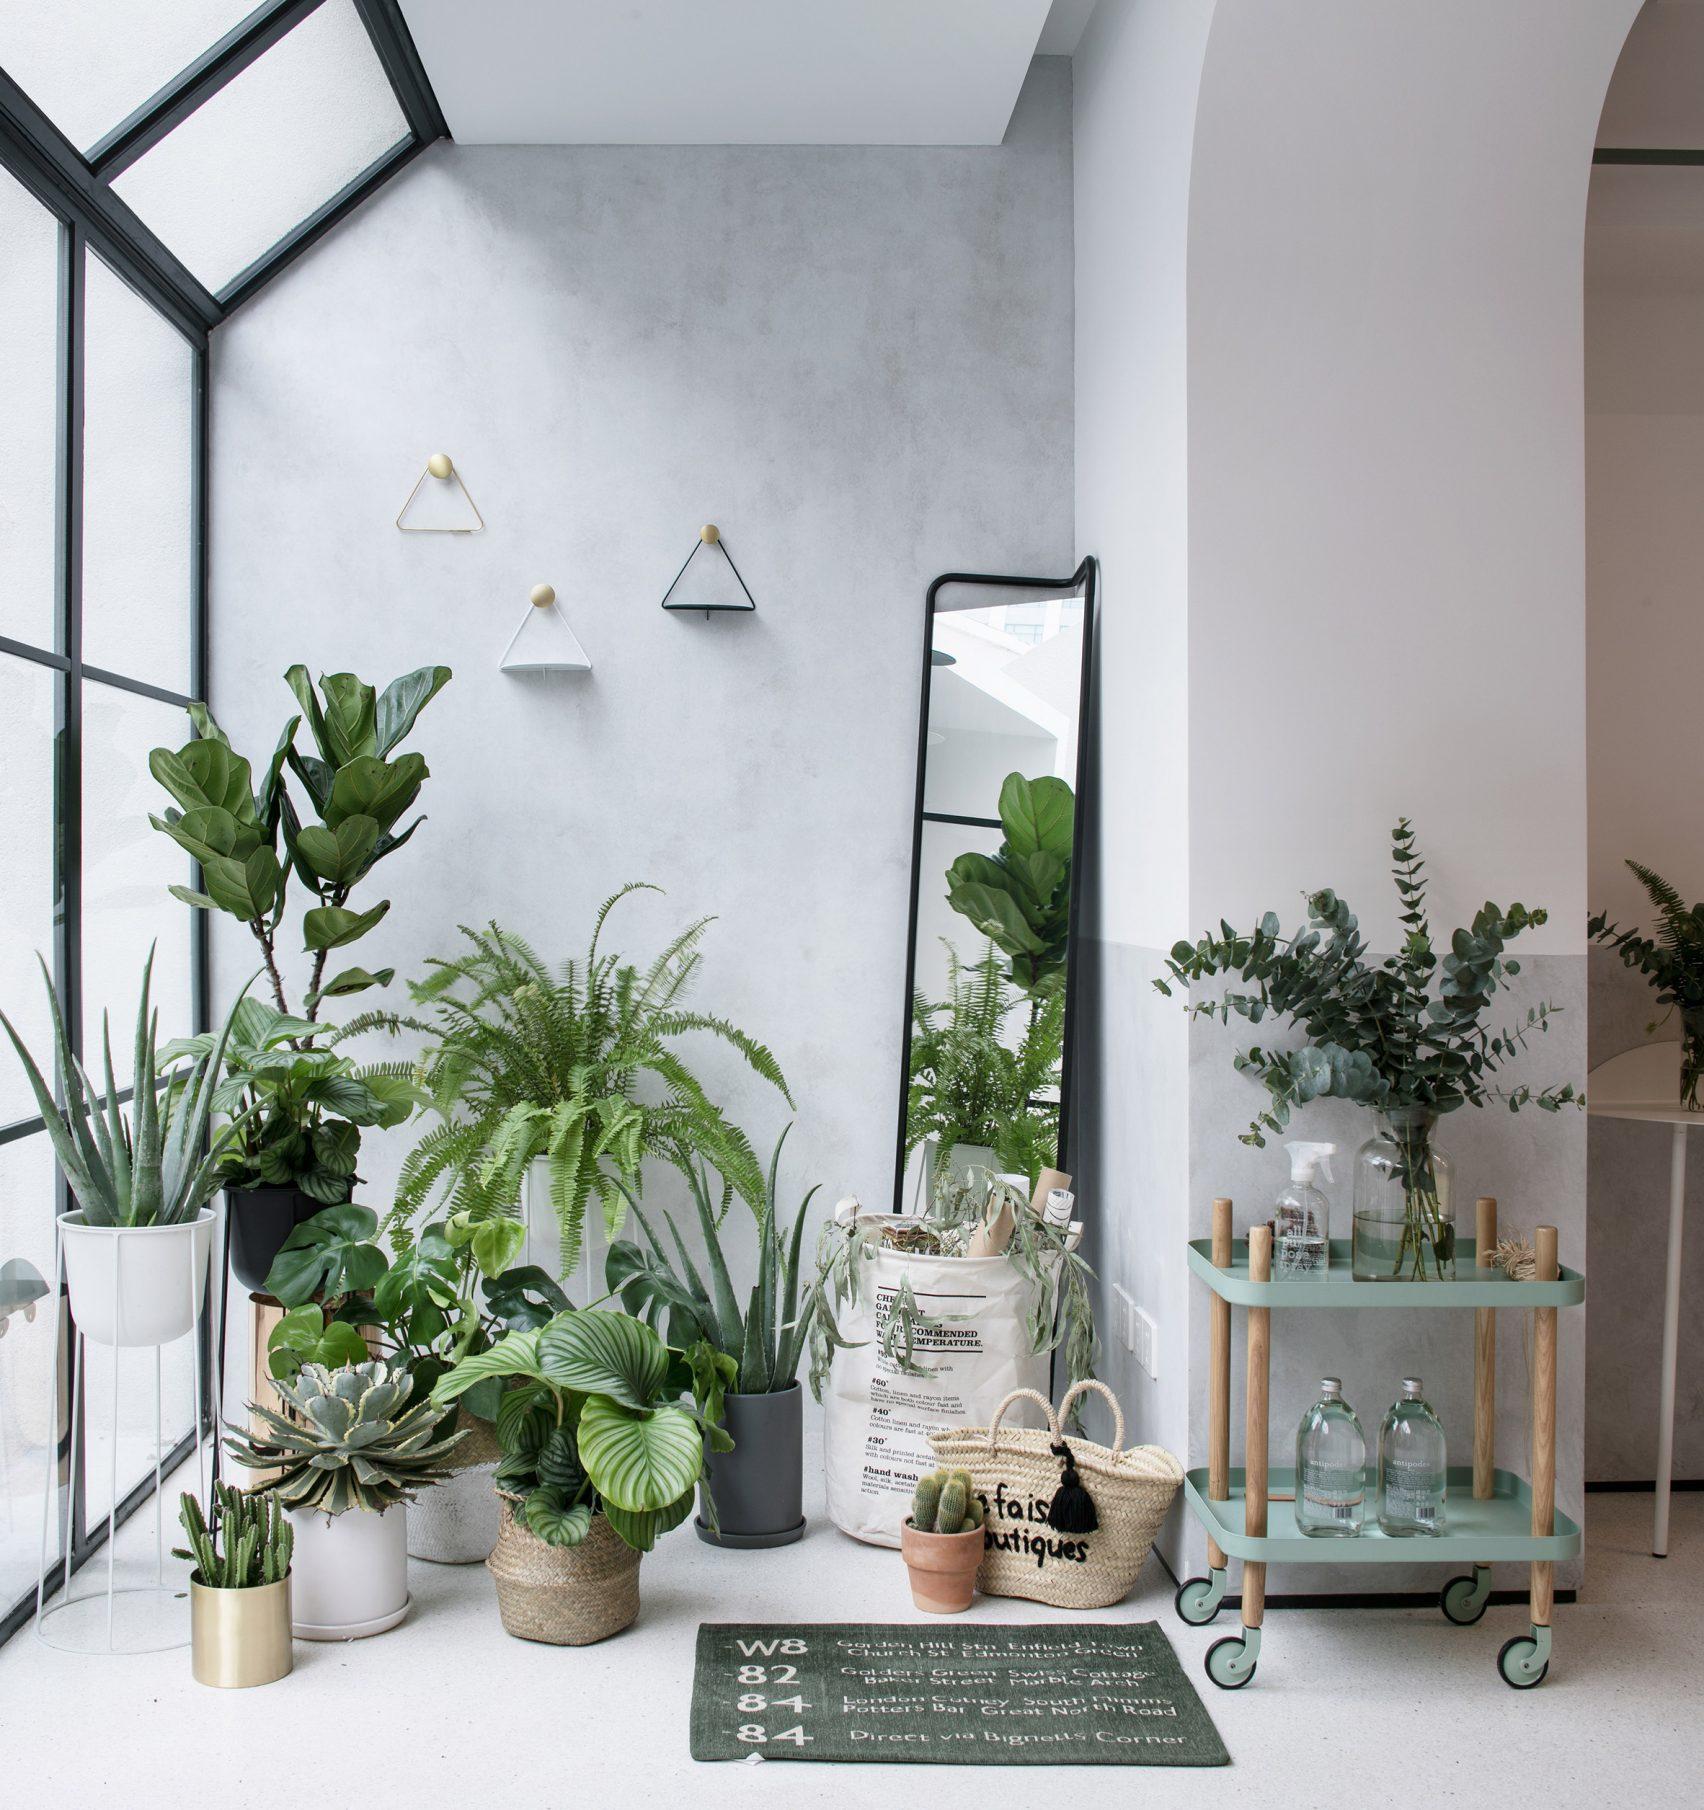 a-white-house-a-growing-home-lk-rigi-design_dezeen_2364_col_4-1704x1810.jpg